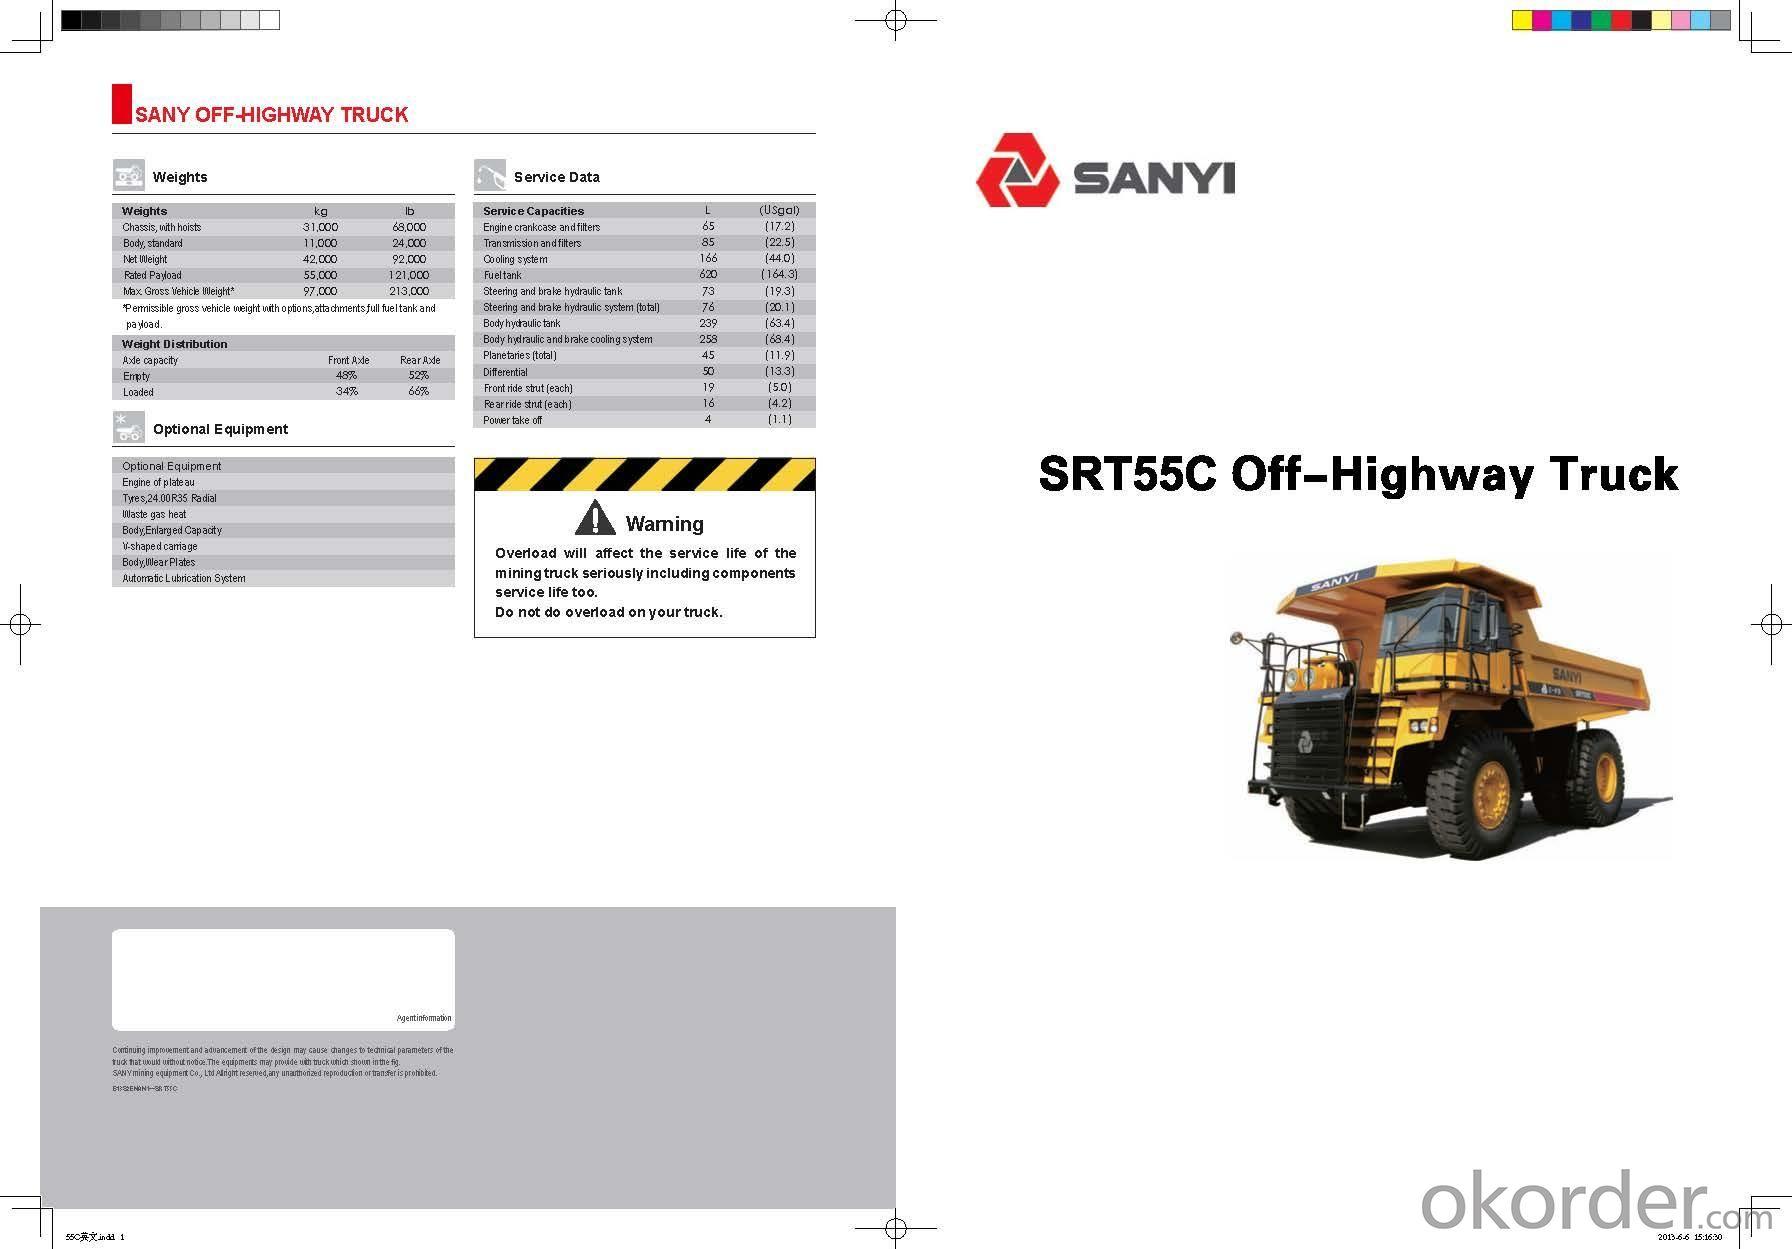 SANYI OFFHIGHWAY TRUCK SRT55